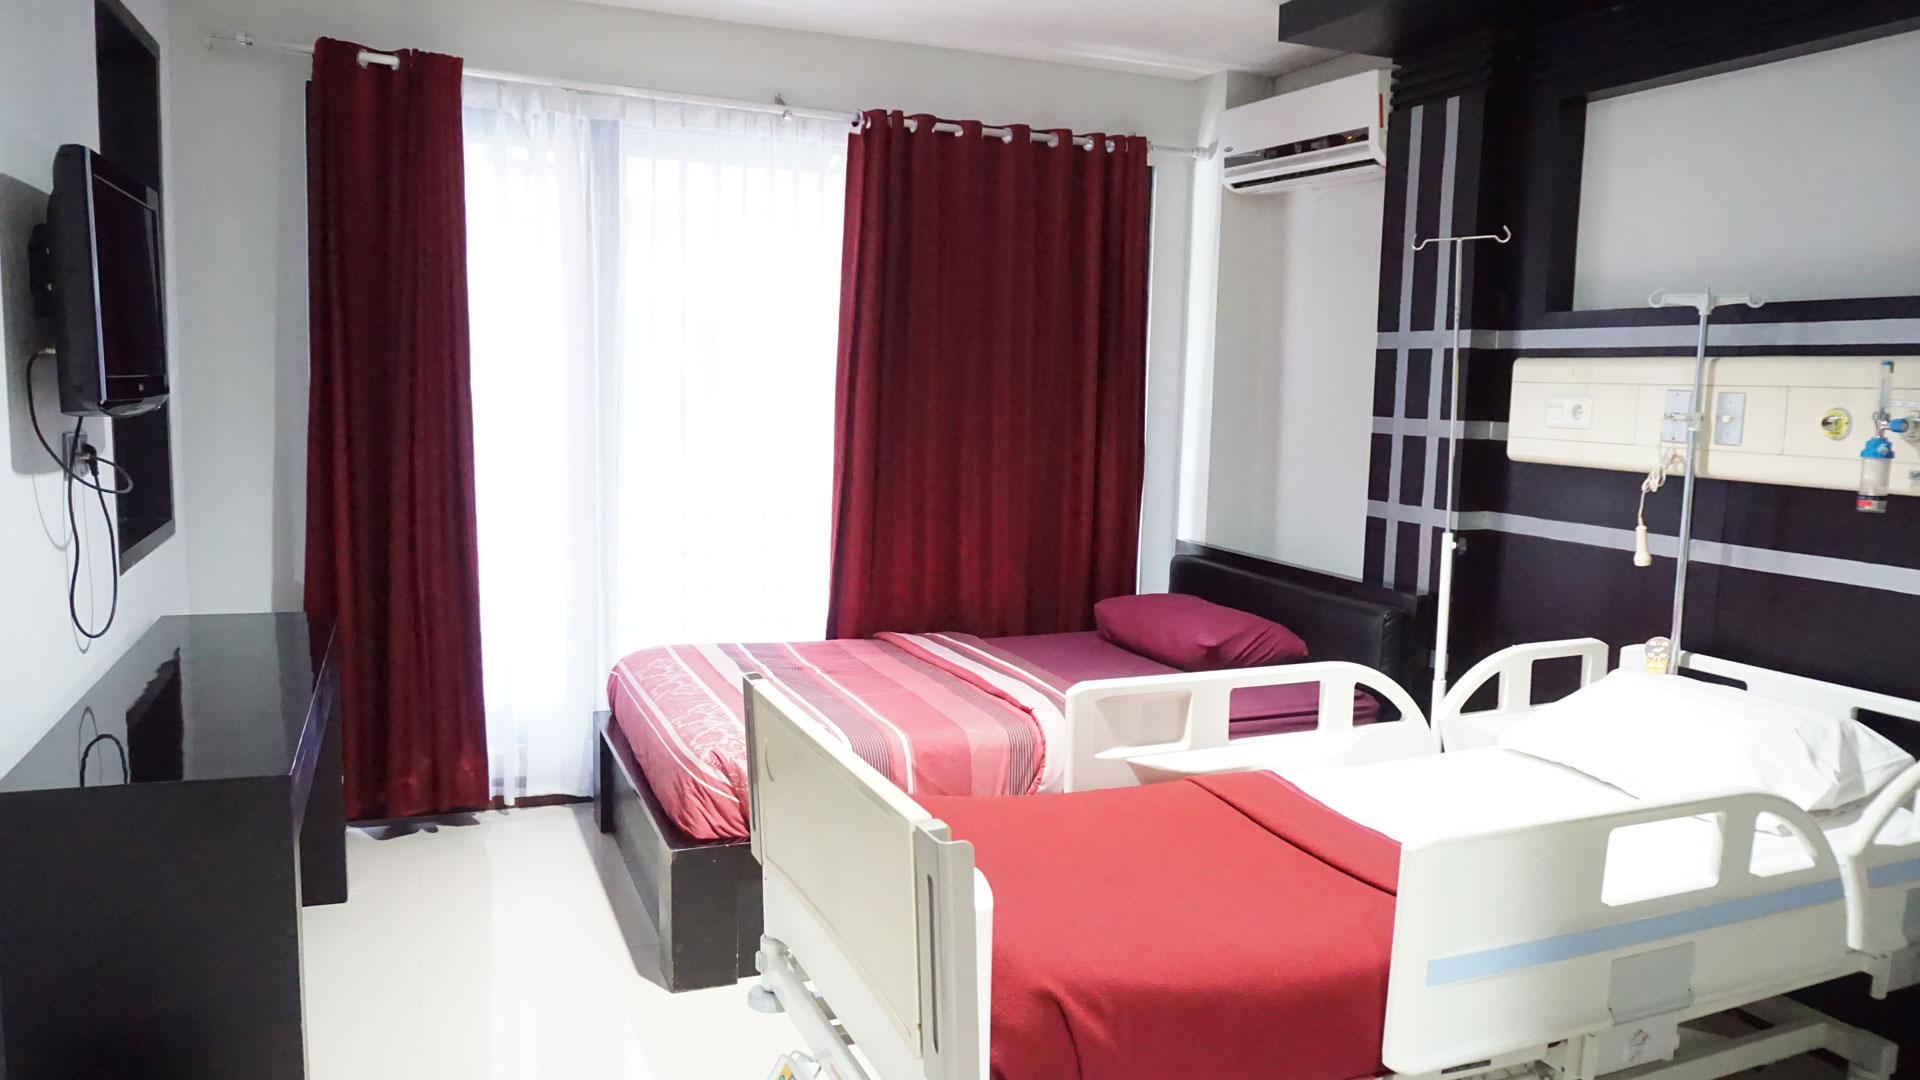 Royal-Mejesty-Bali-Royal-Hospital-1